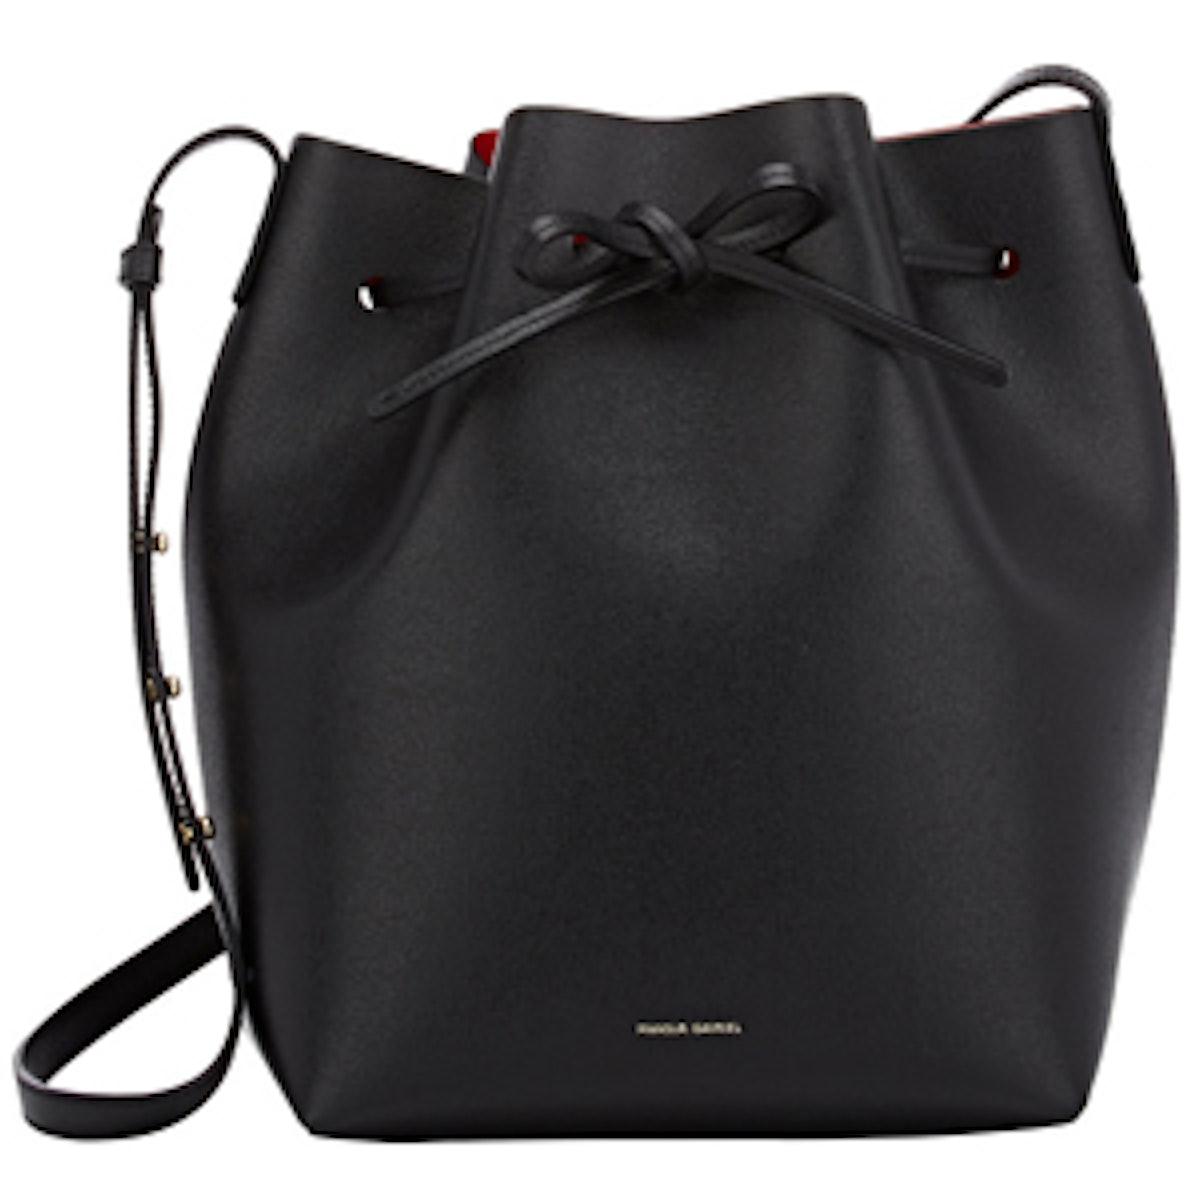 Large Leather Bucket Bag